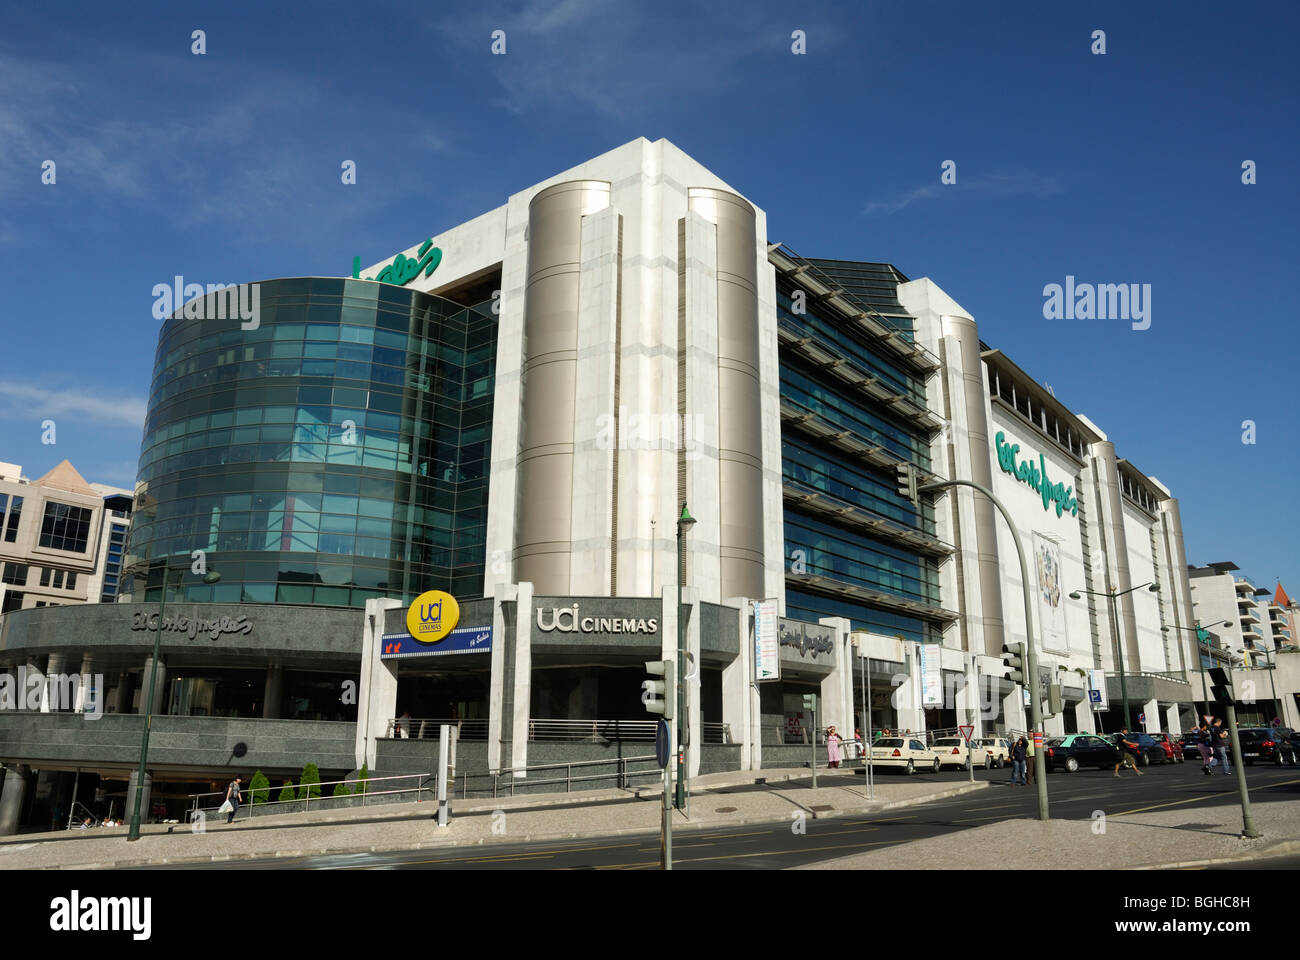 Lissabon. Portugal. El Corte Ingles Einkaufszentrum Av Antonio Augusto de Aguiar. Stockbild